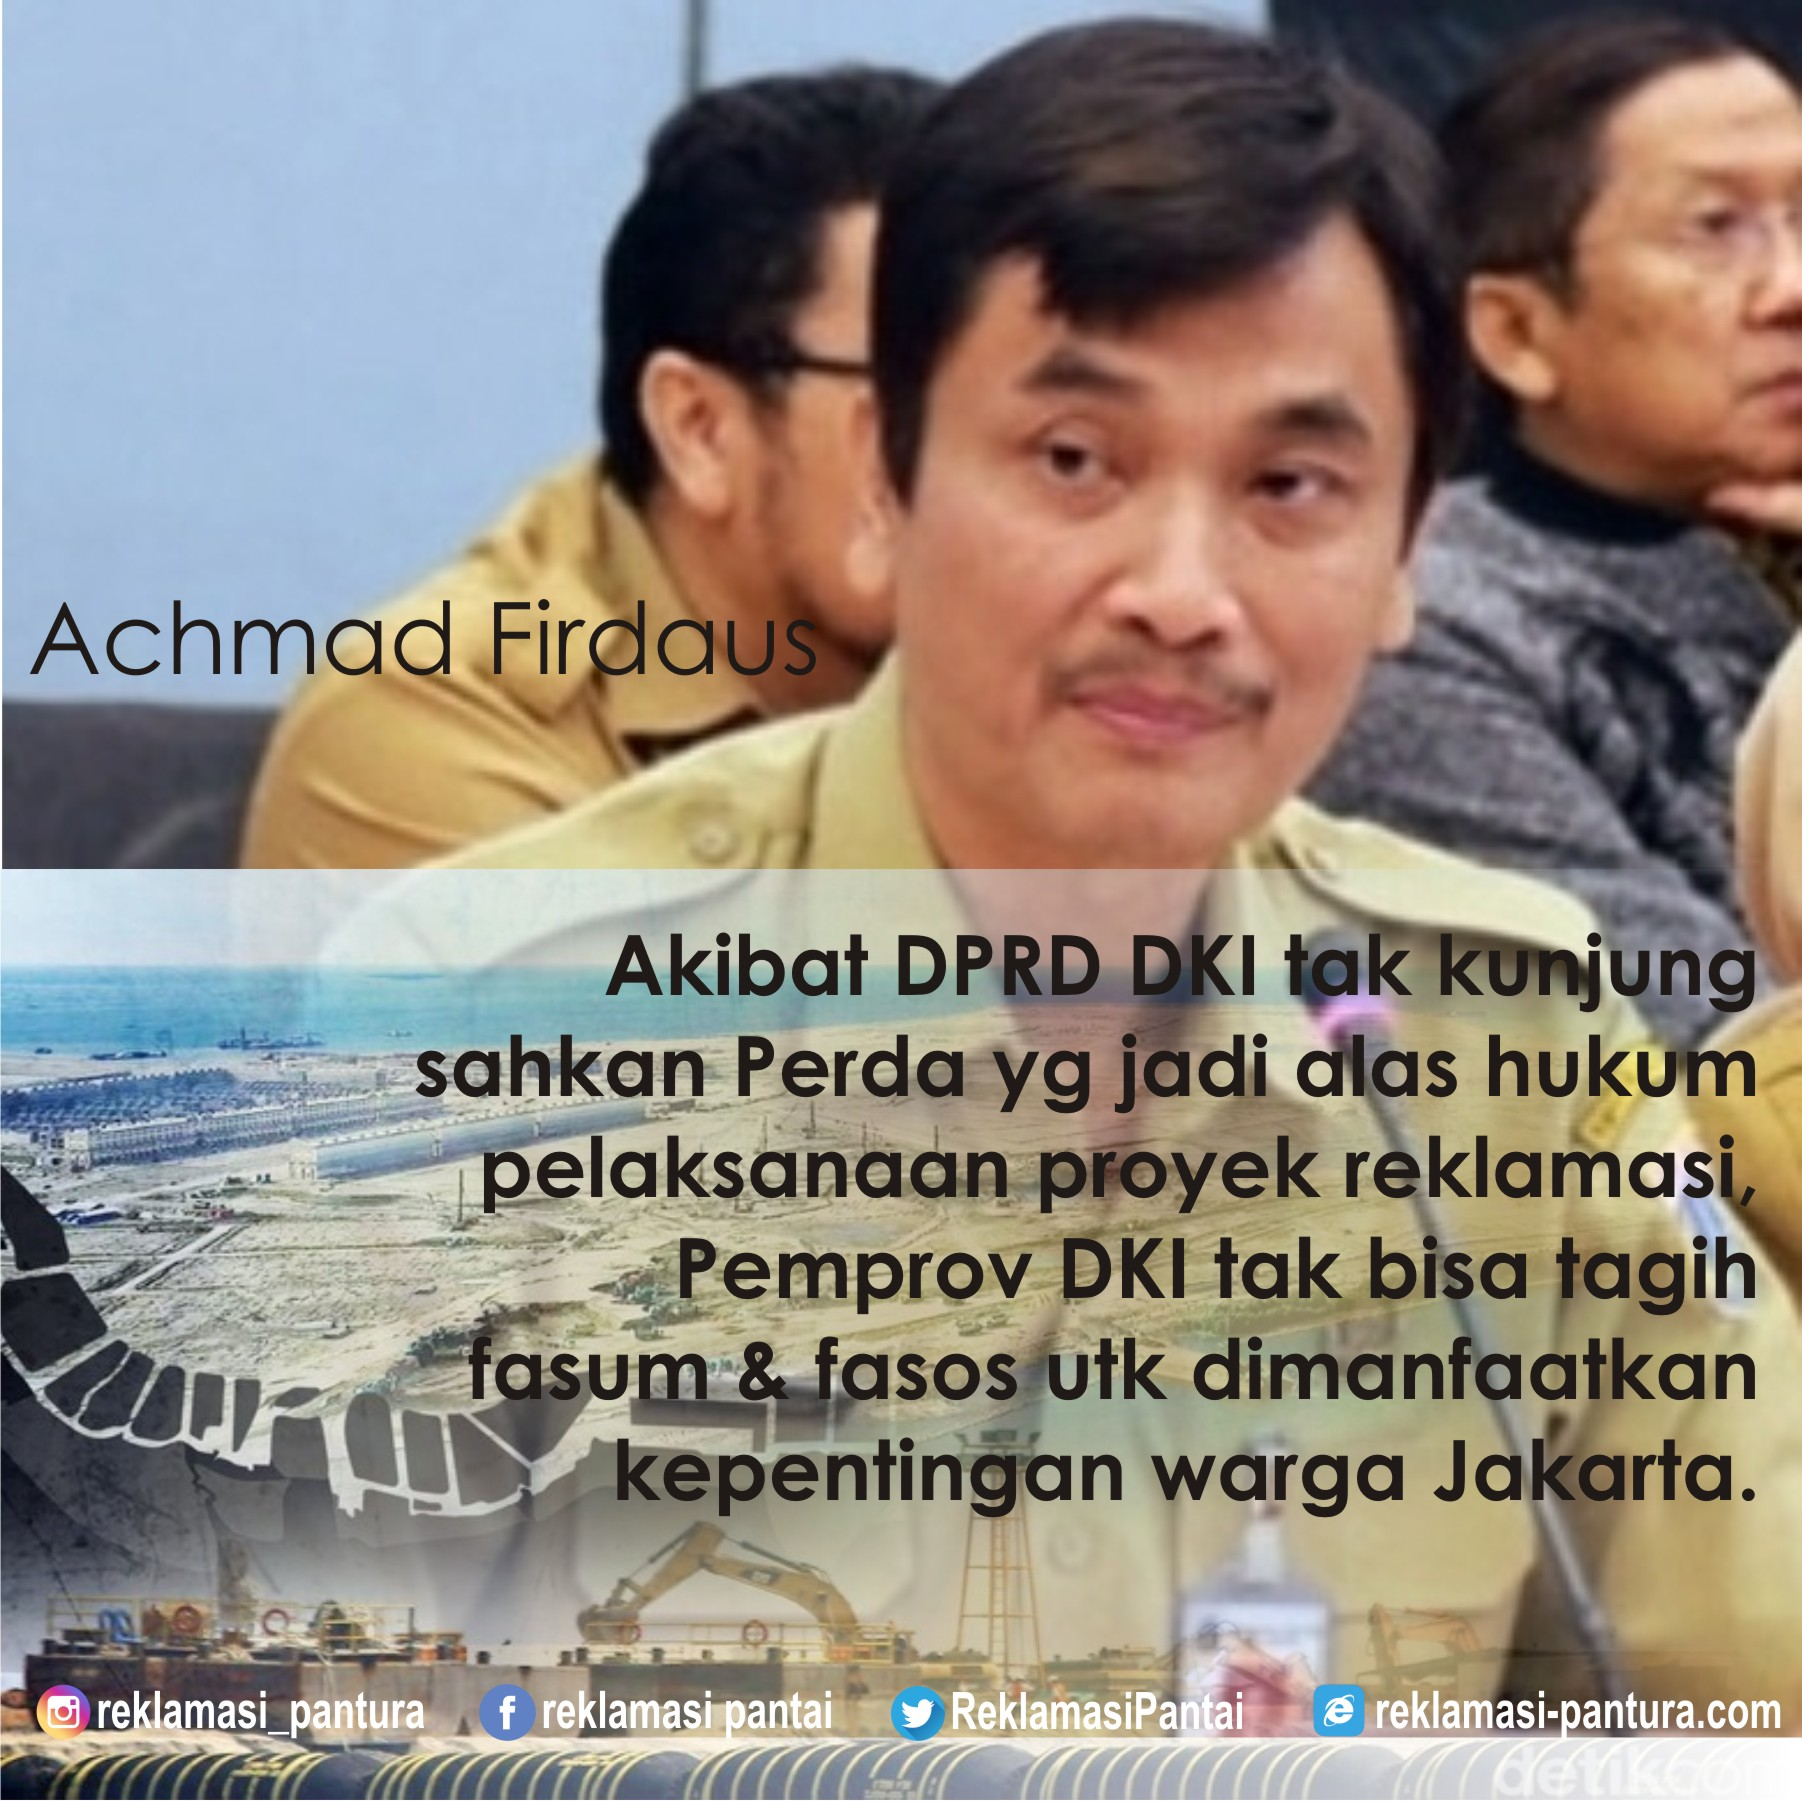 Fasum-fasos reklamasi terganjal Raperda di DPRD